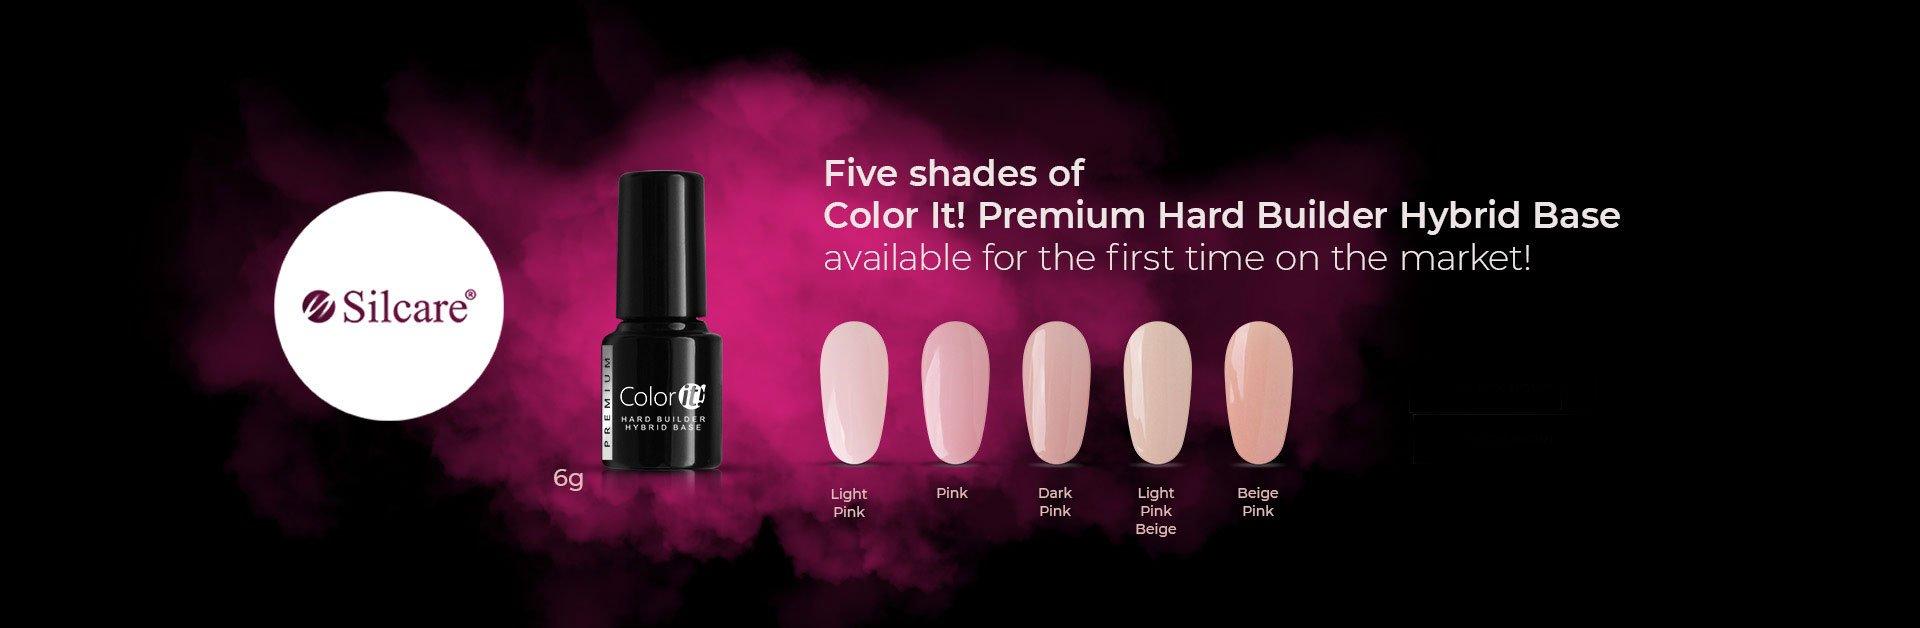 silcare five shades